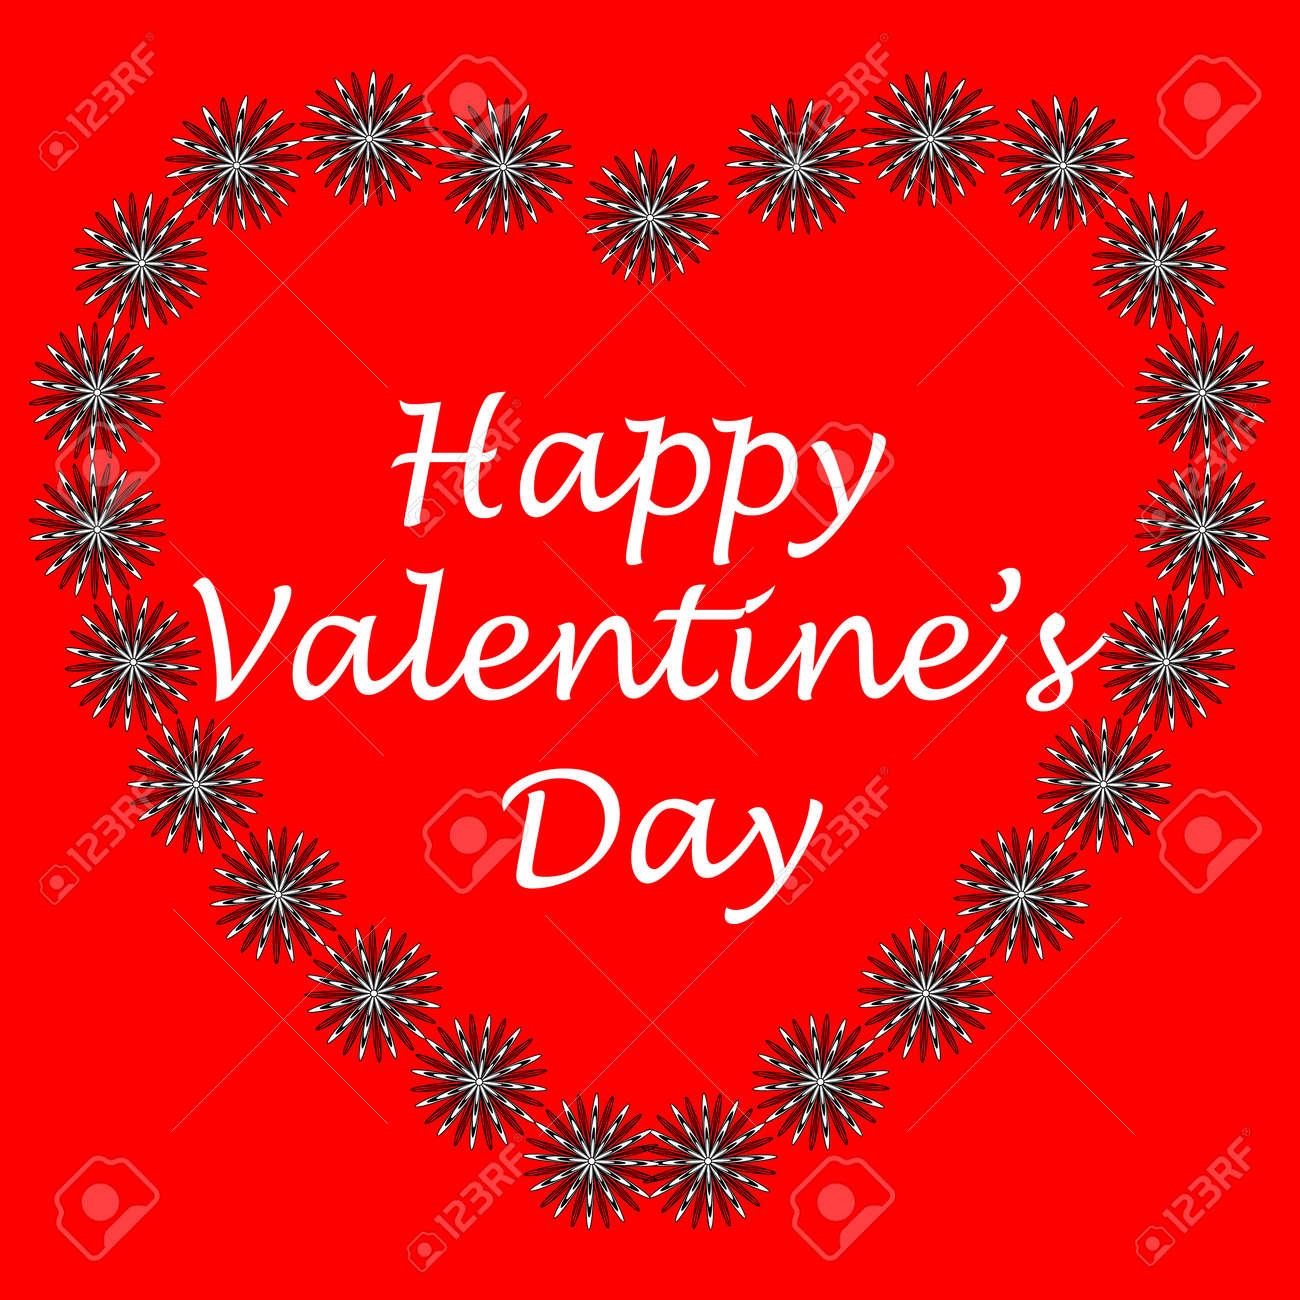 Postcard In Zen Art Style Happy Valentine S Day Heart Of Flowers